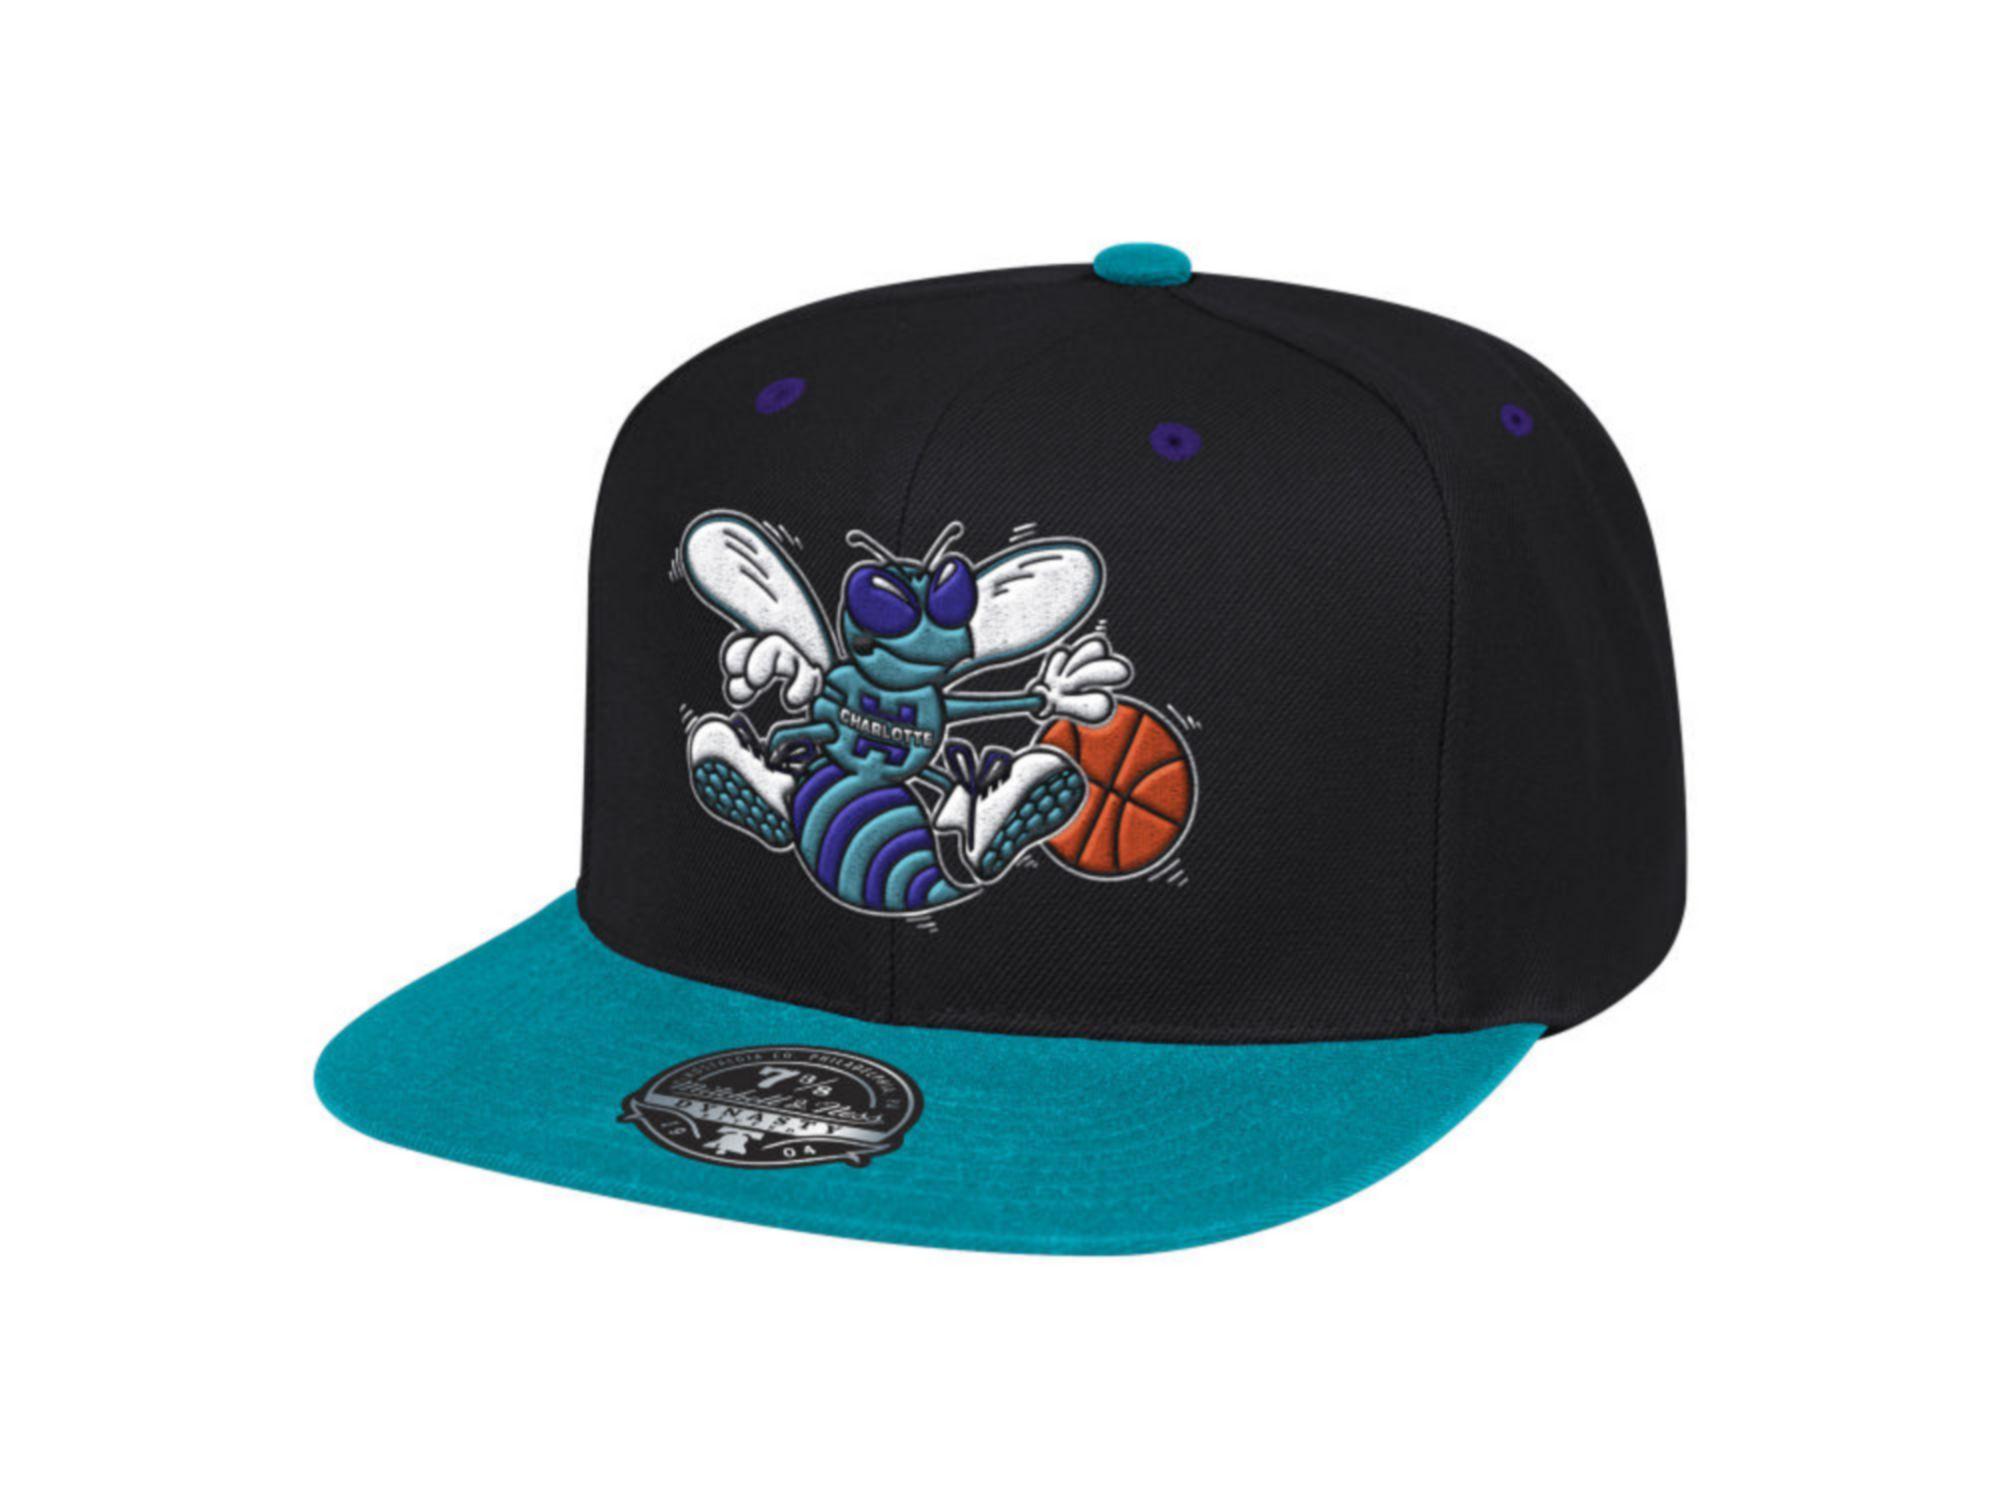 Mitchell & Ness Charlotte Hornets Hardwood Classic Reload 2.0 2 Tone Cap & Reviews - NBA - Sports Fan Shop - Macy's